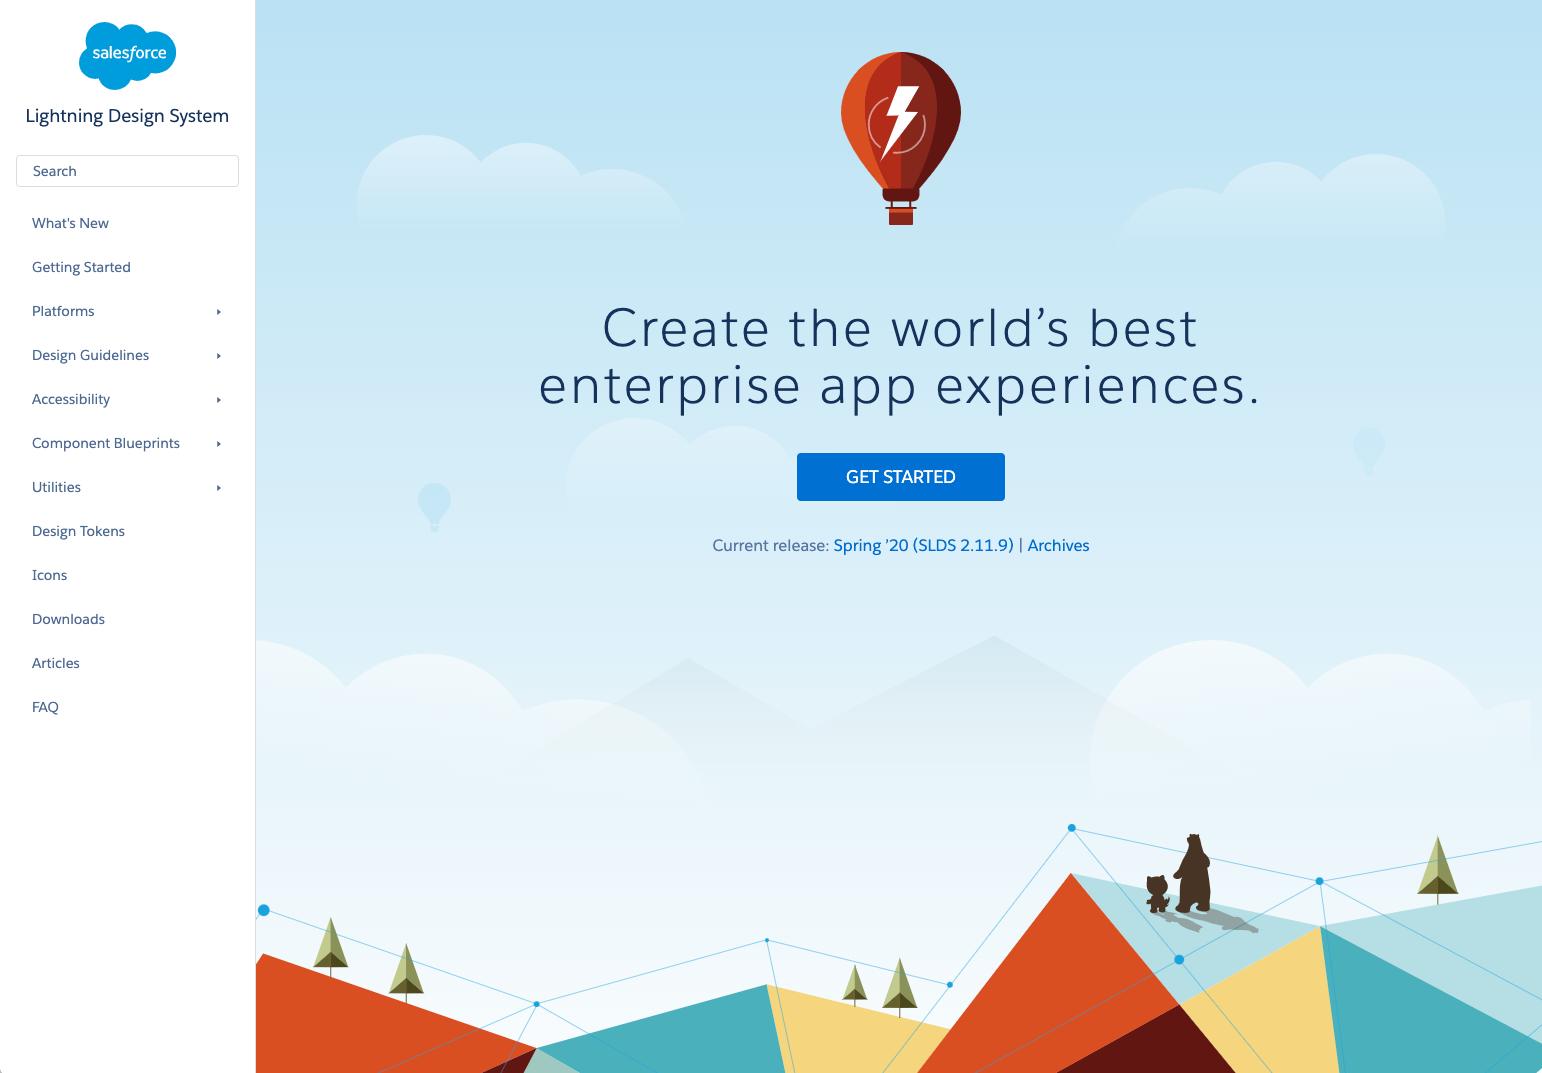 Salesforce Lightning DesignSystem Homepage